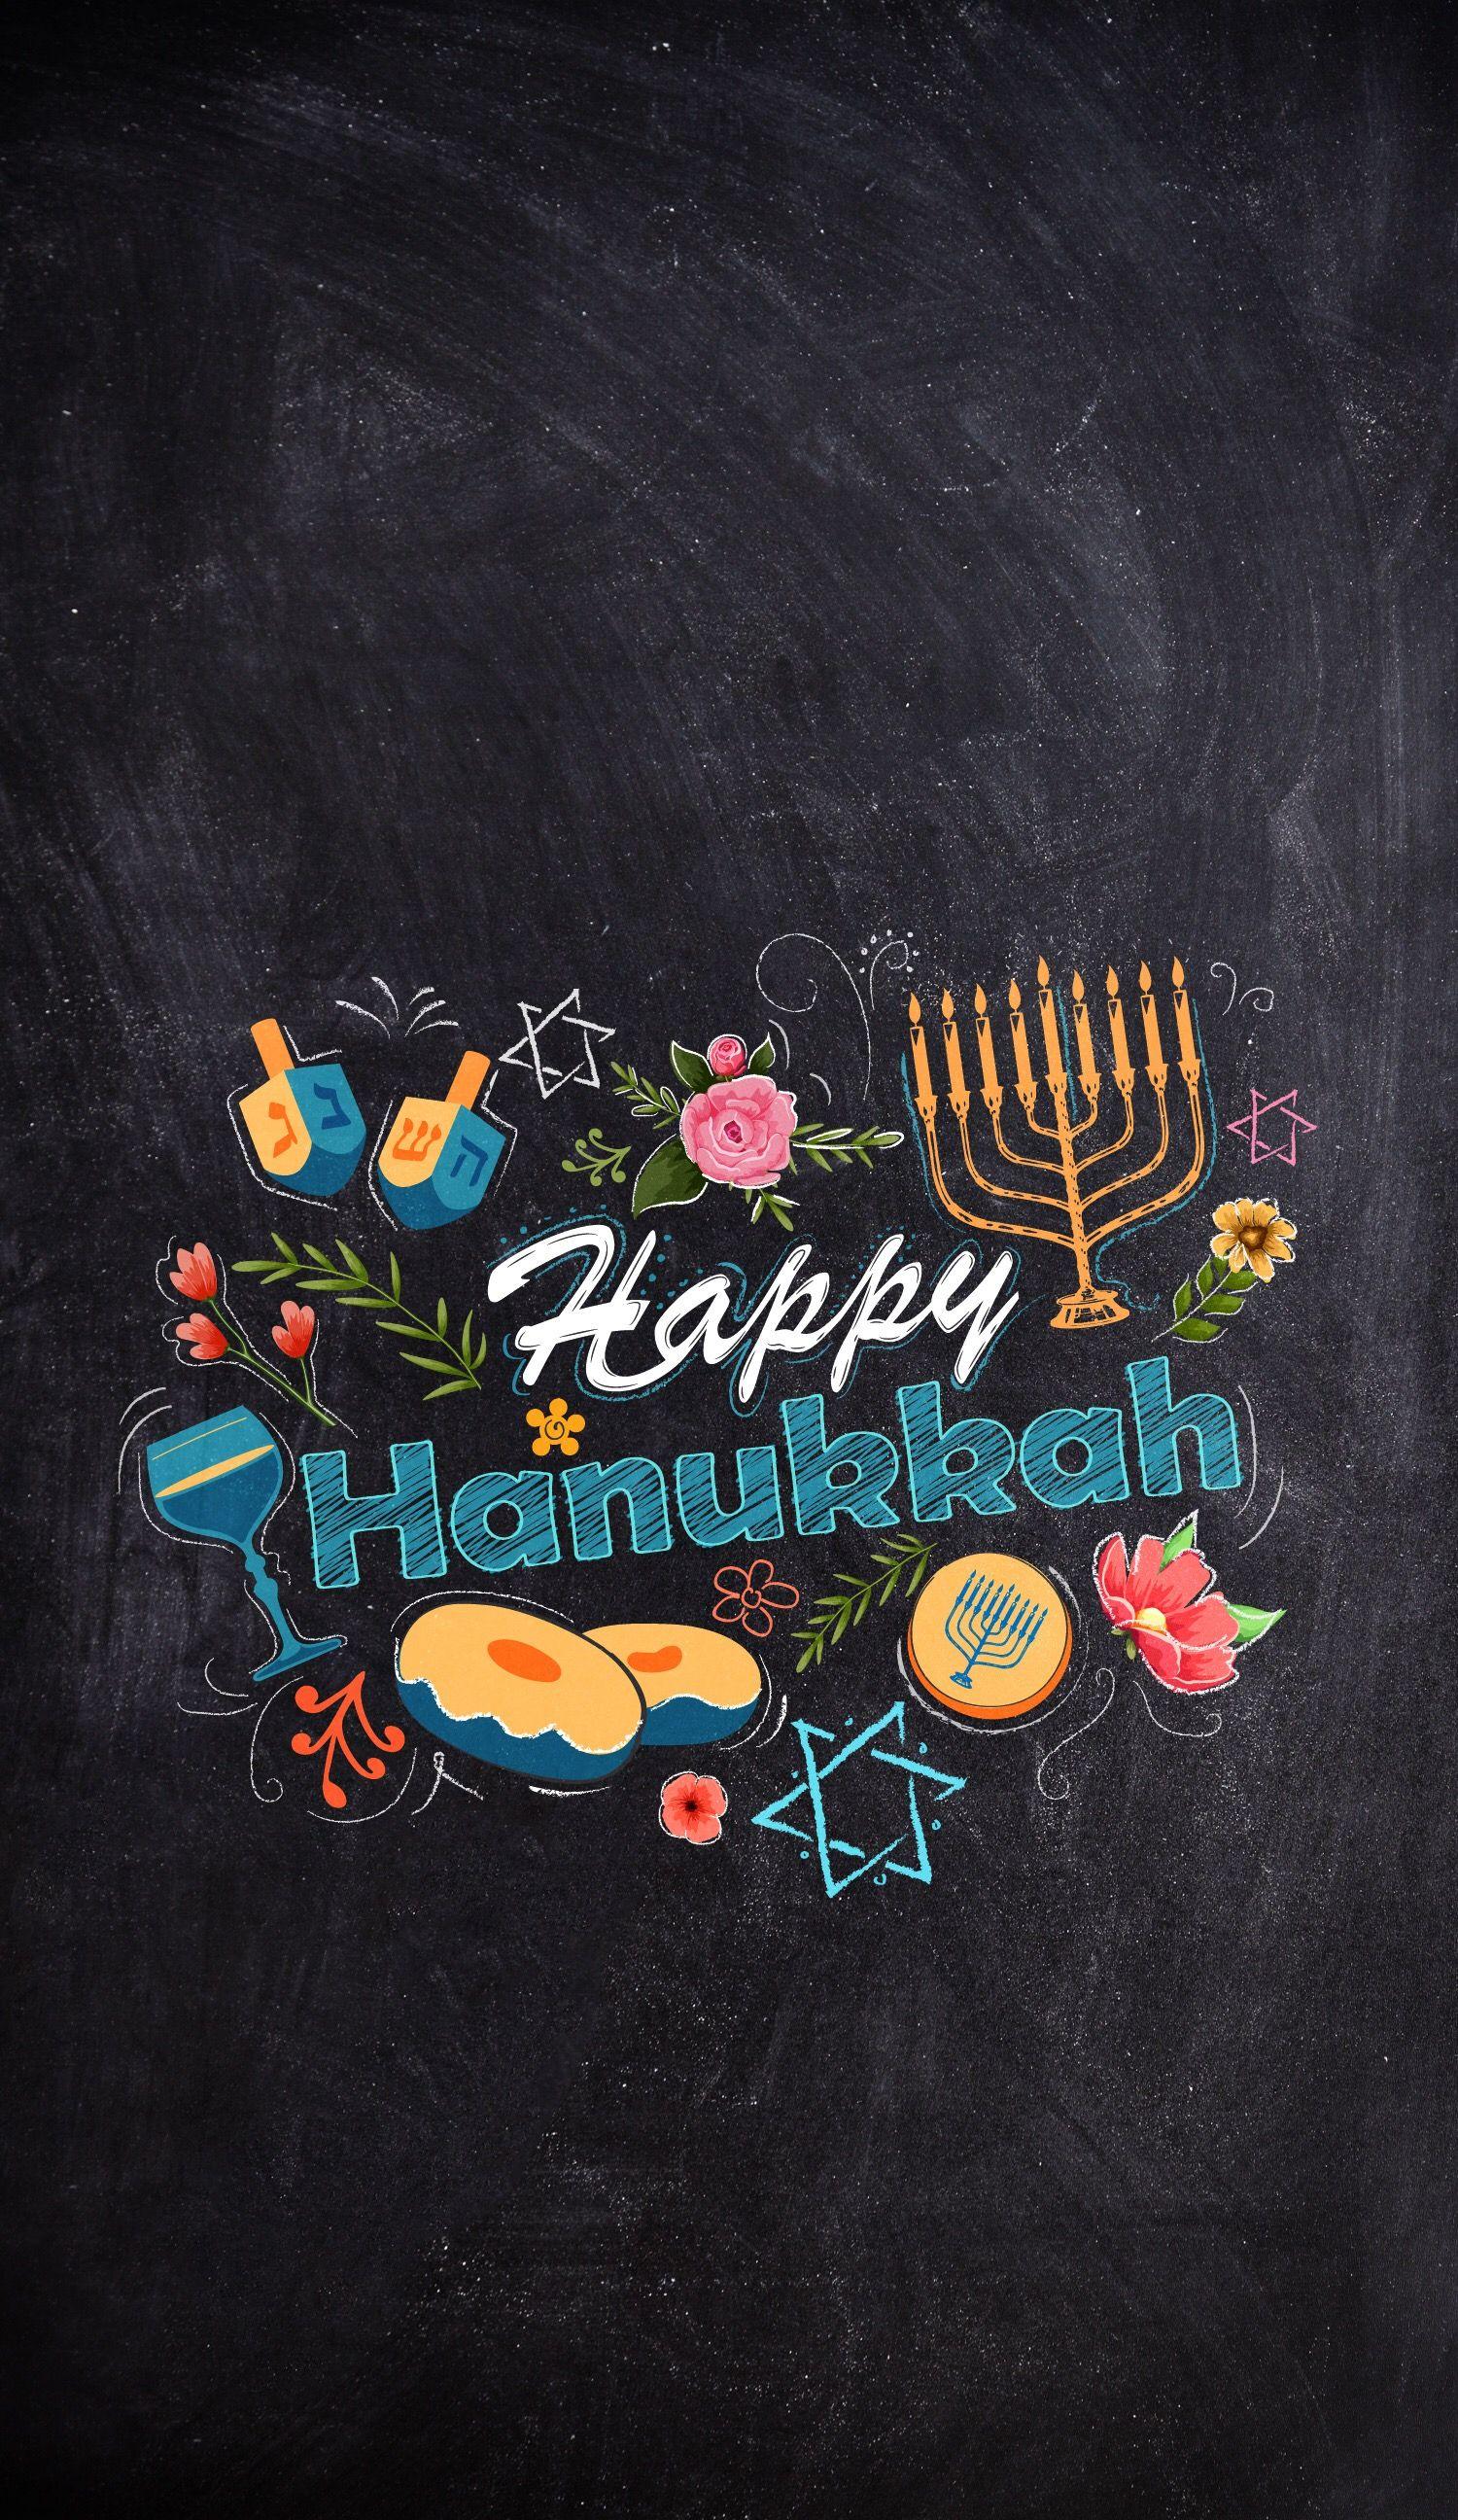 Happy Hanukkah Hanukkah Pictures Happy Hanukkah Hanukkah Decorations Jewish Holidays